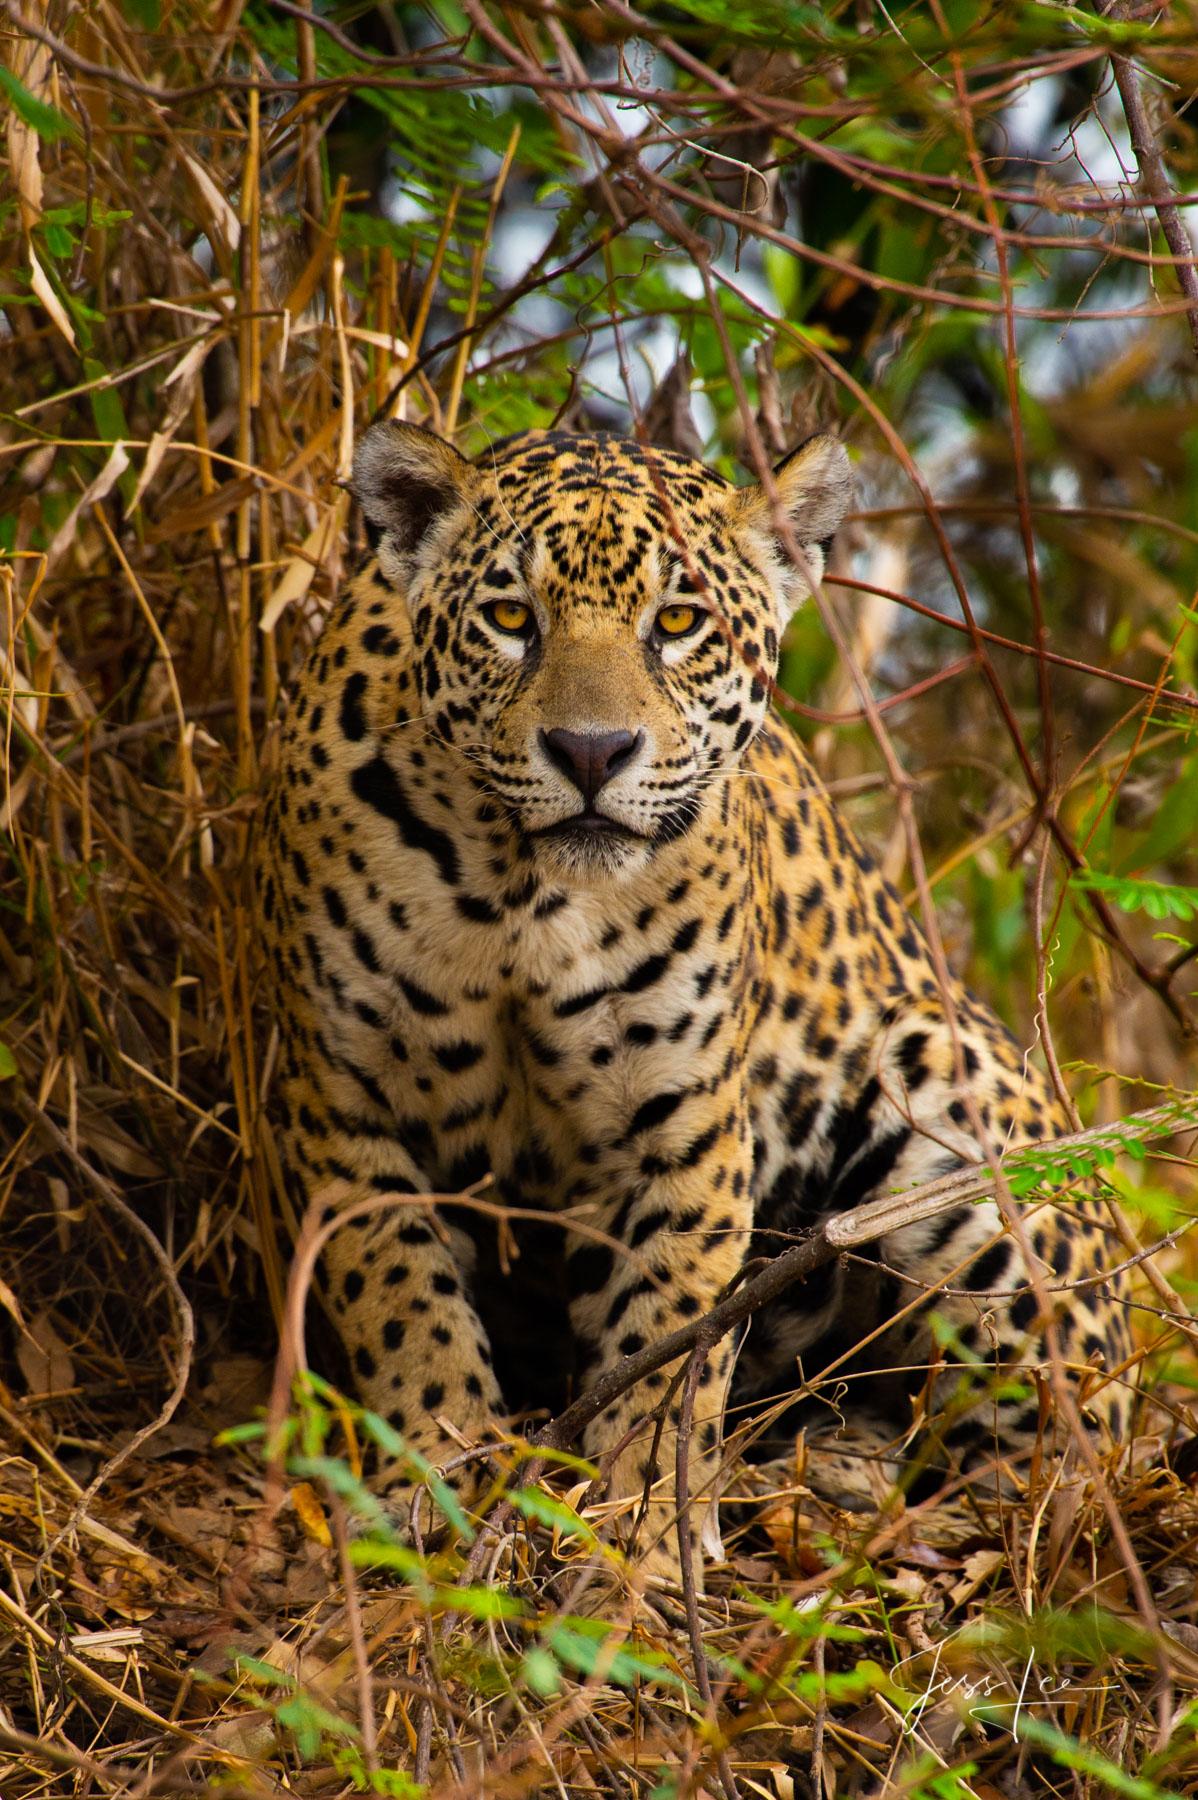 Fine art Jaguar print limited edition of 300 luxury prints by Jess Lee. All photographs copyright © Jess Lee